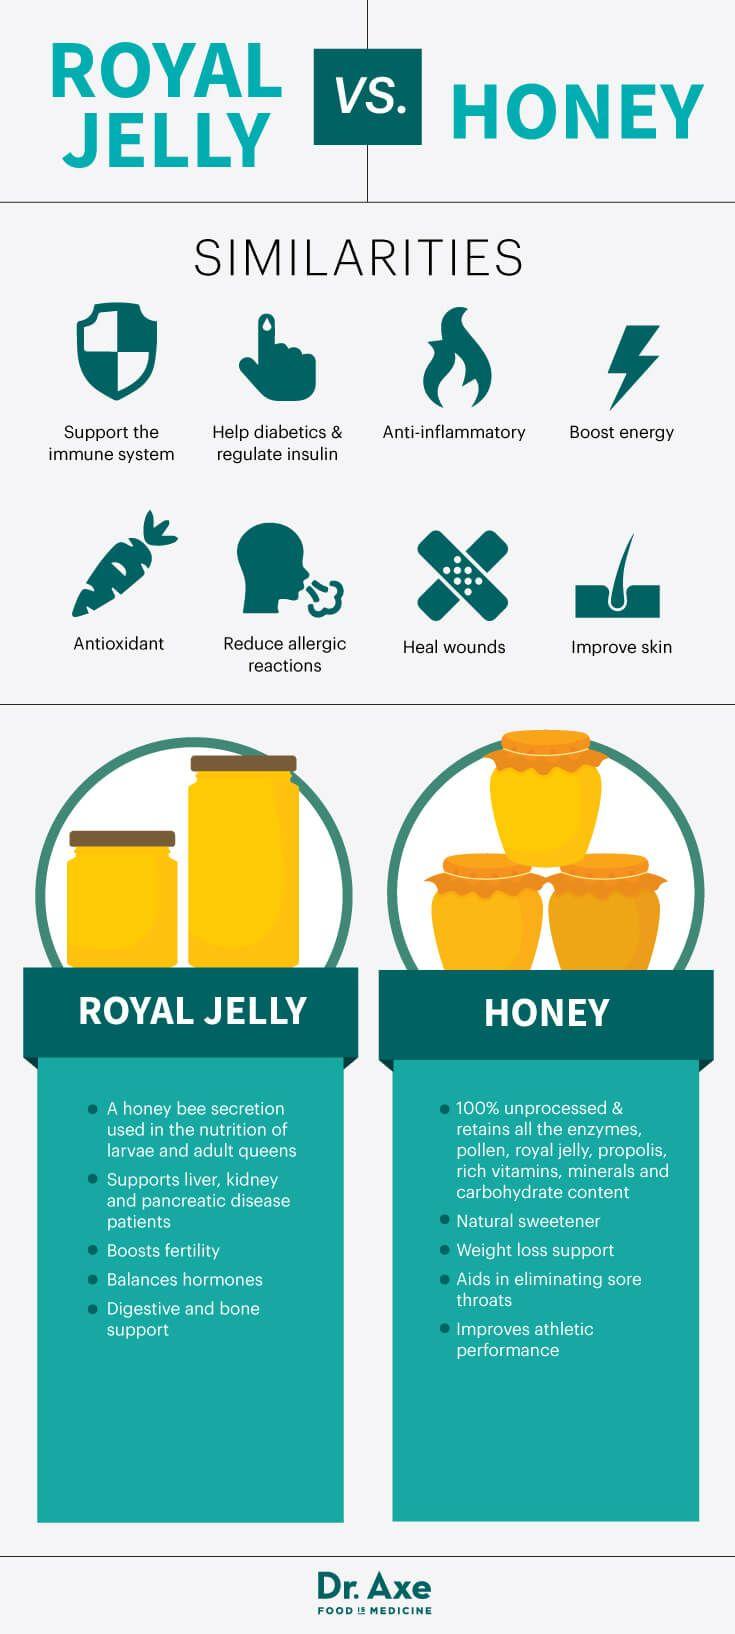 Royal jelly vs. honey - Dr. Axe http://www.draxe.com #health #holistic #natural